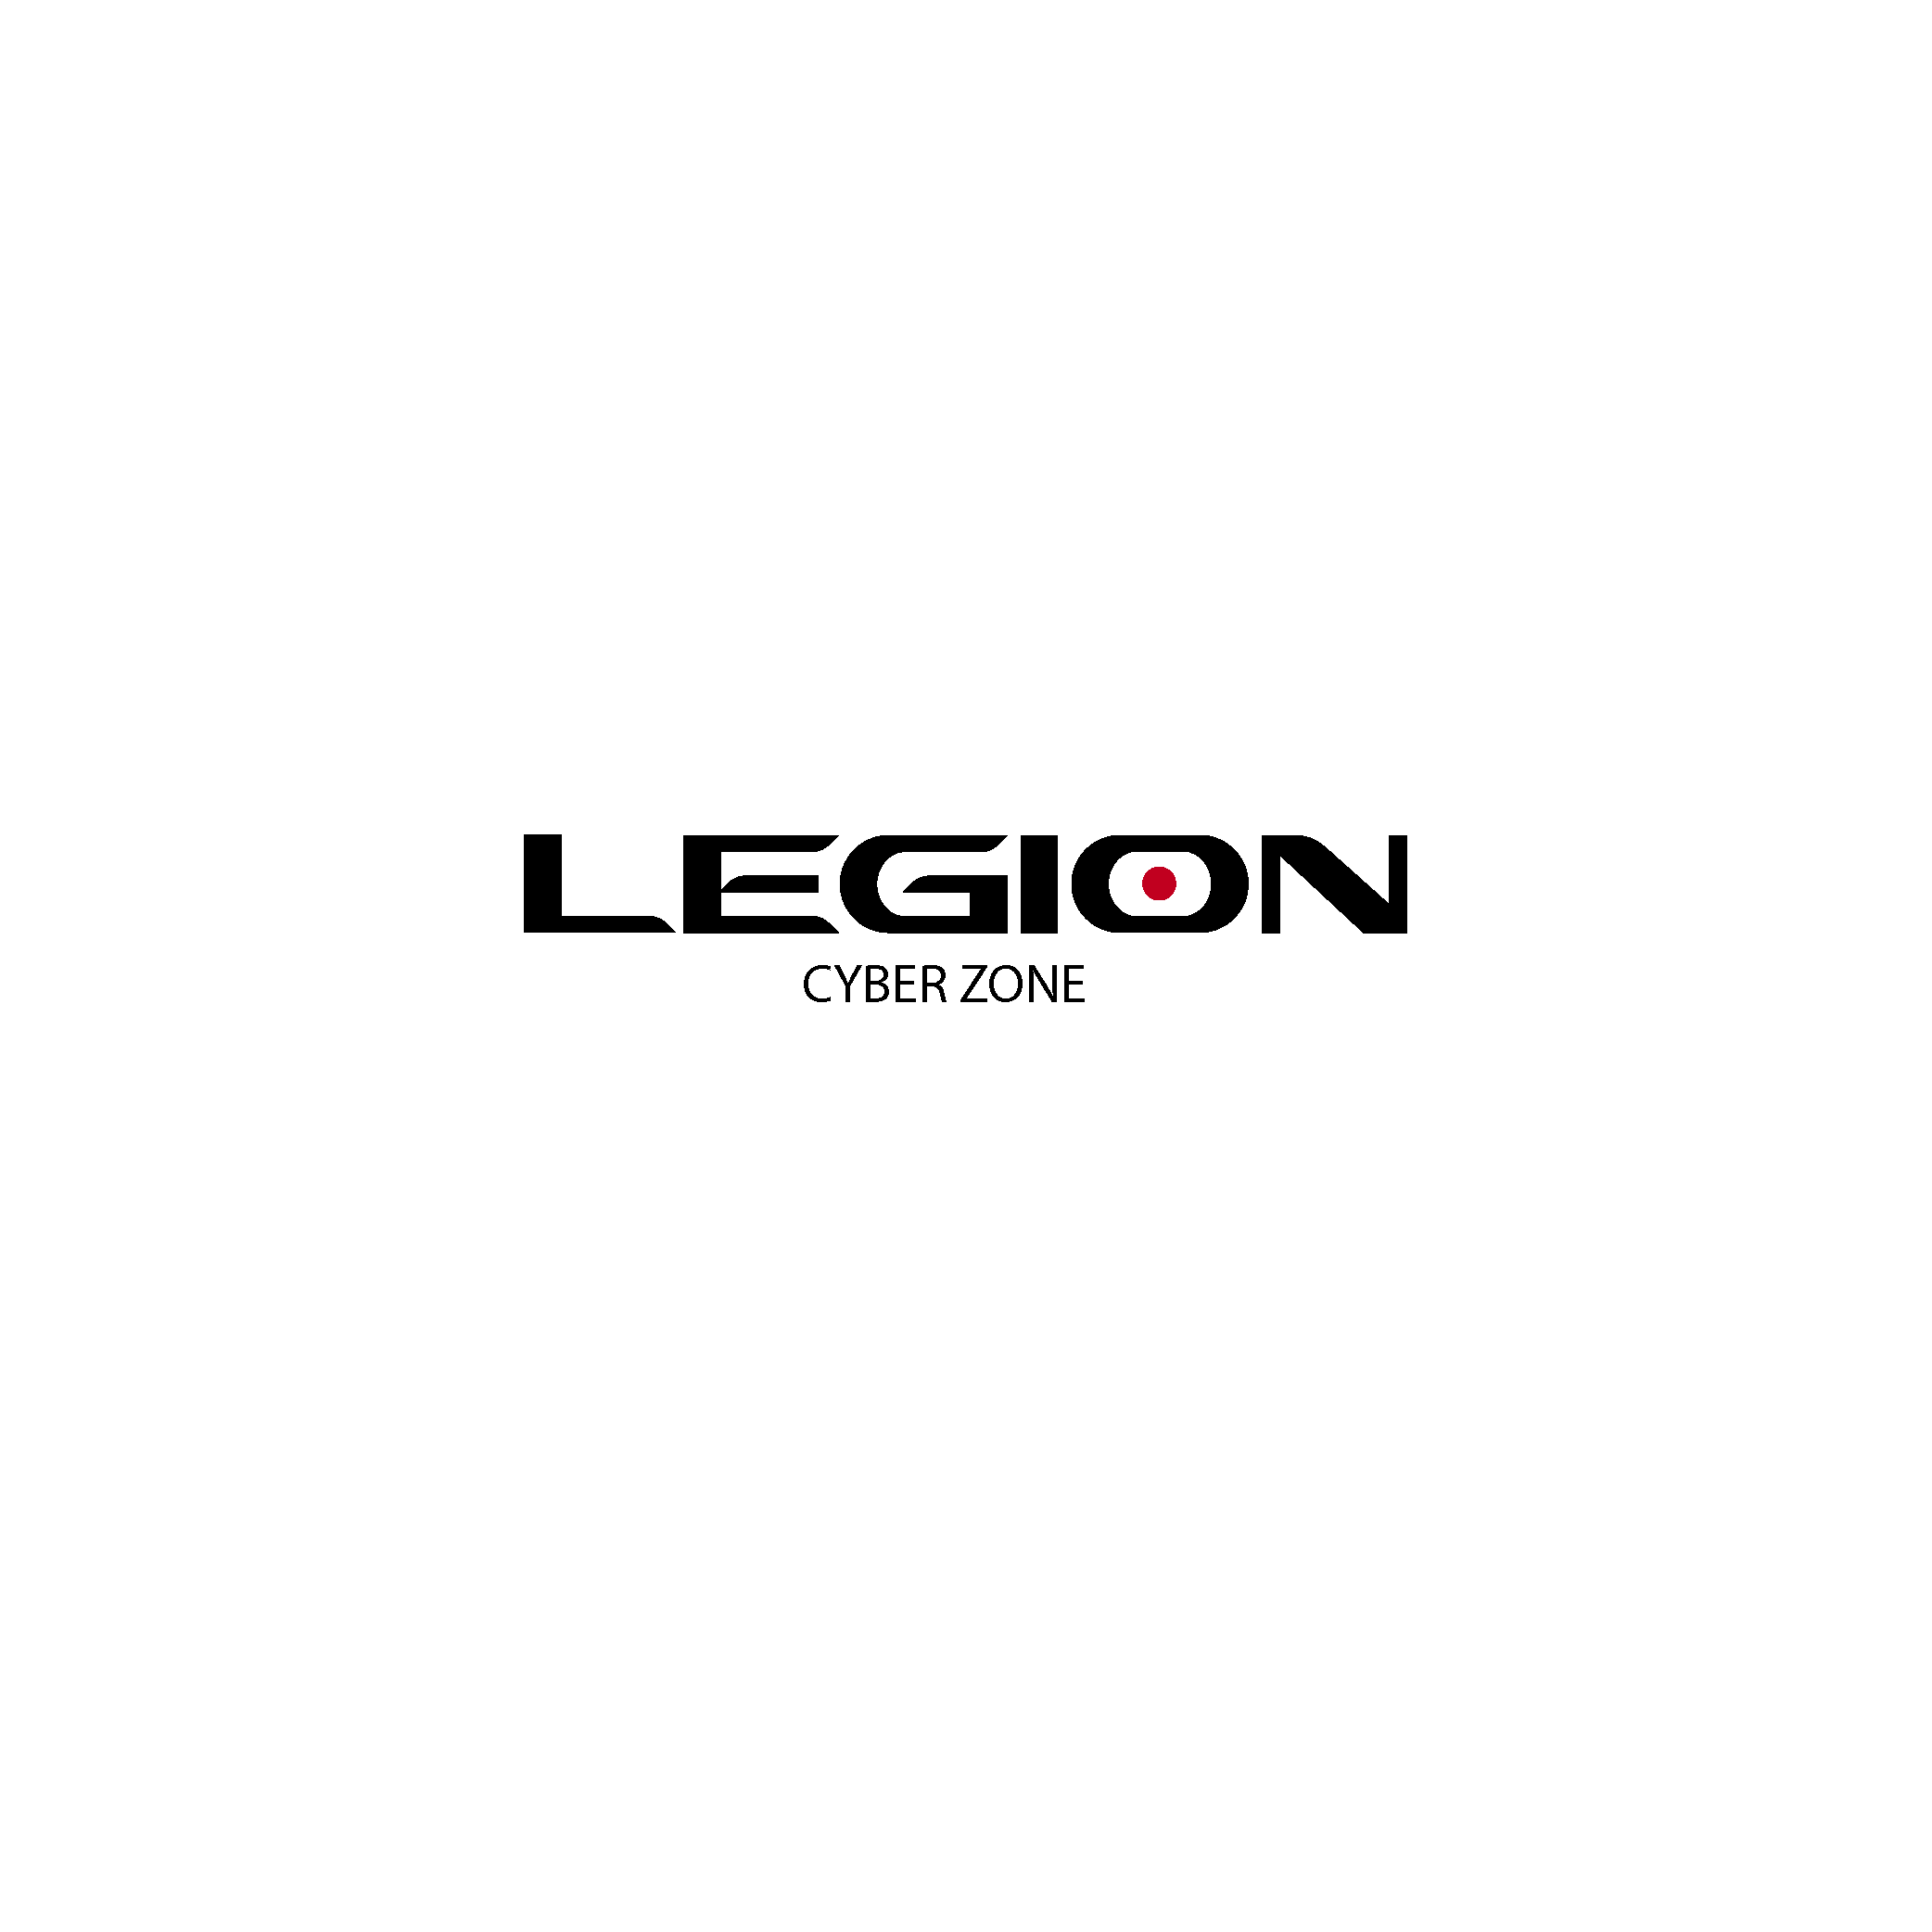 LEGION | Cyber Zone